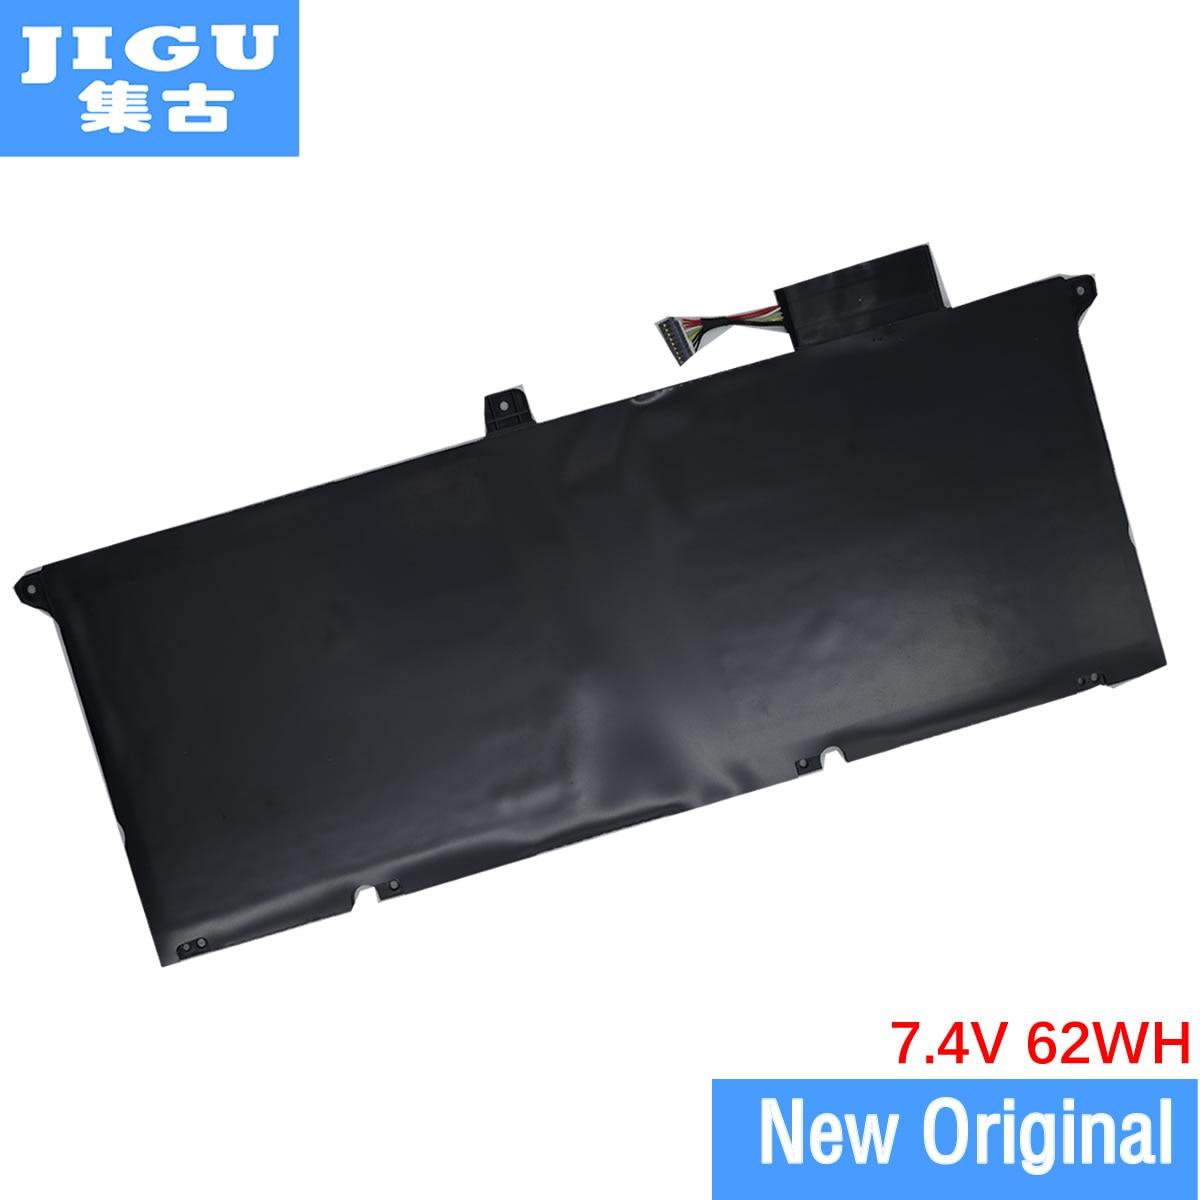 все цены на JIGU 8400mAh AA-PBXN8AR Replacement Laptop Battery For Samsung 900X4 900X46 900X4B-A01DE 900X4B-A01FR 900X4B-A03 NP900X4 онлайн